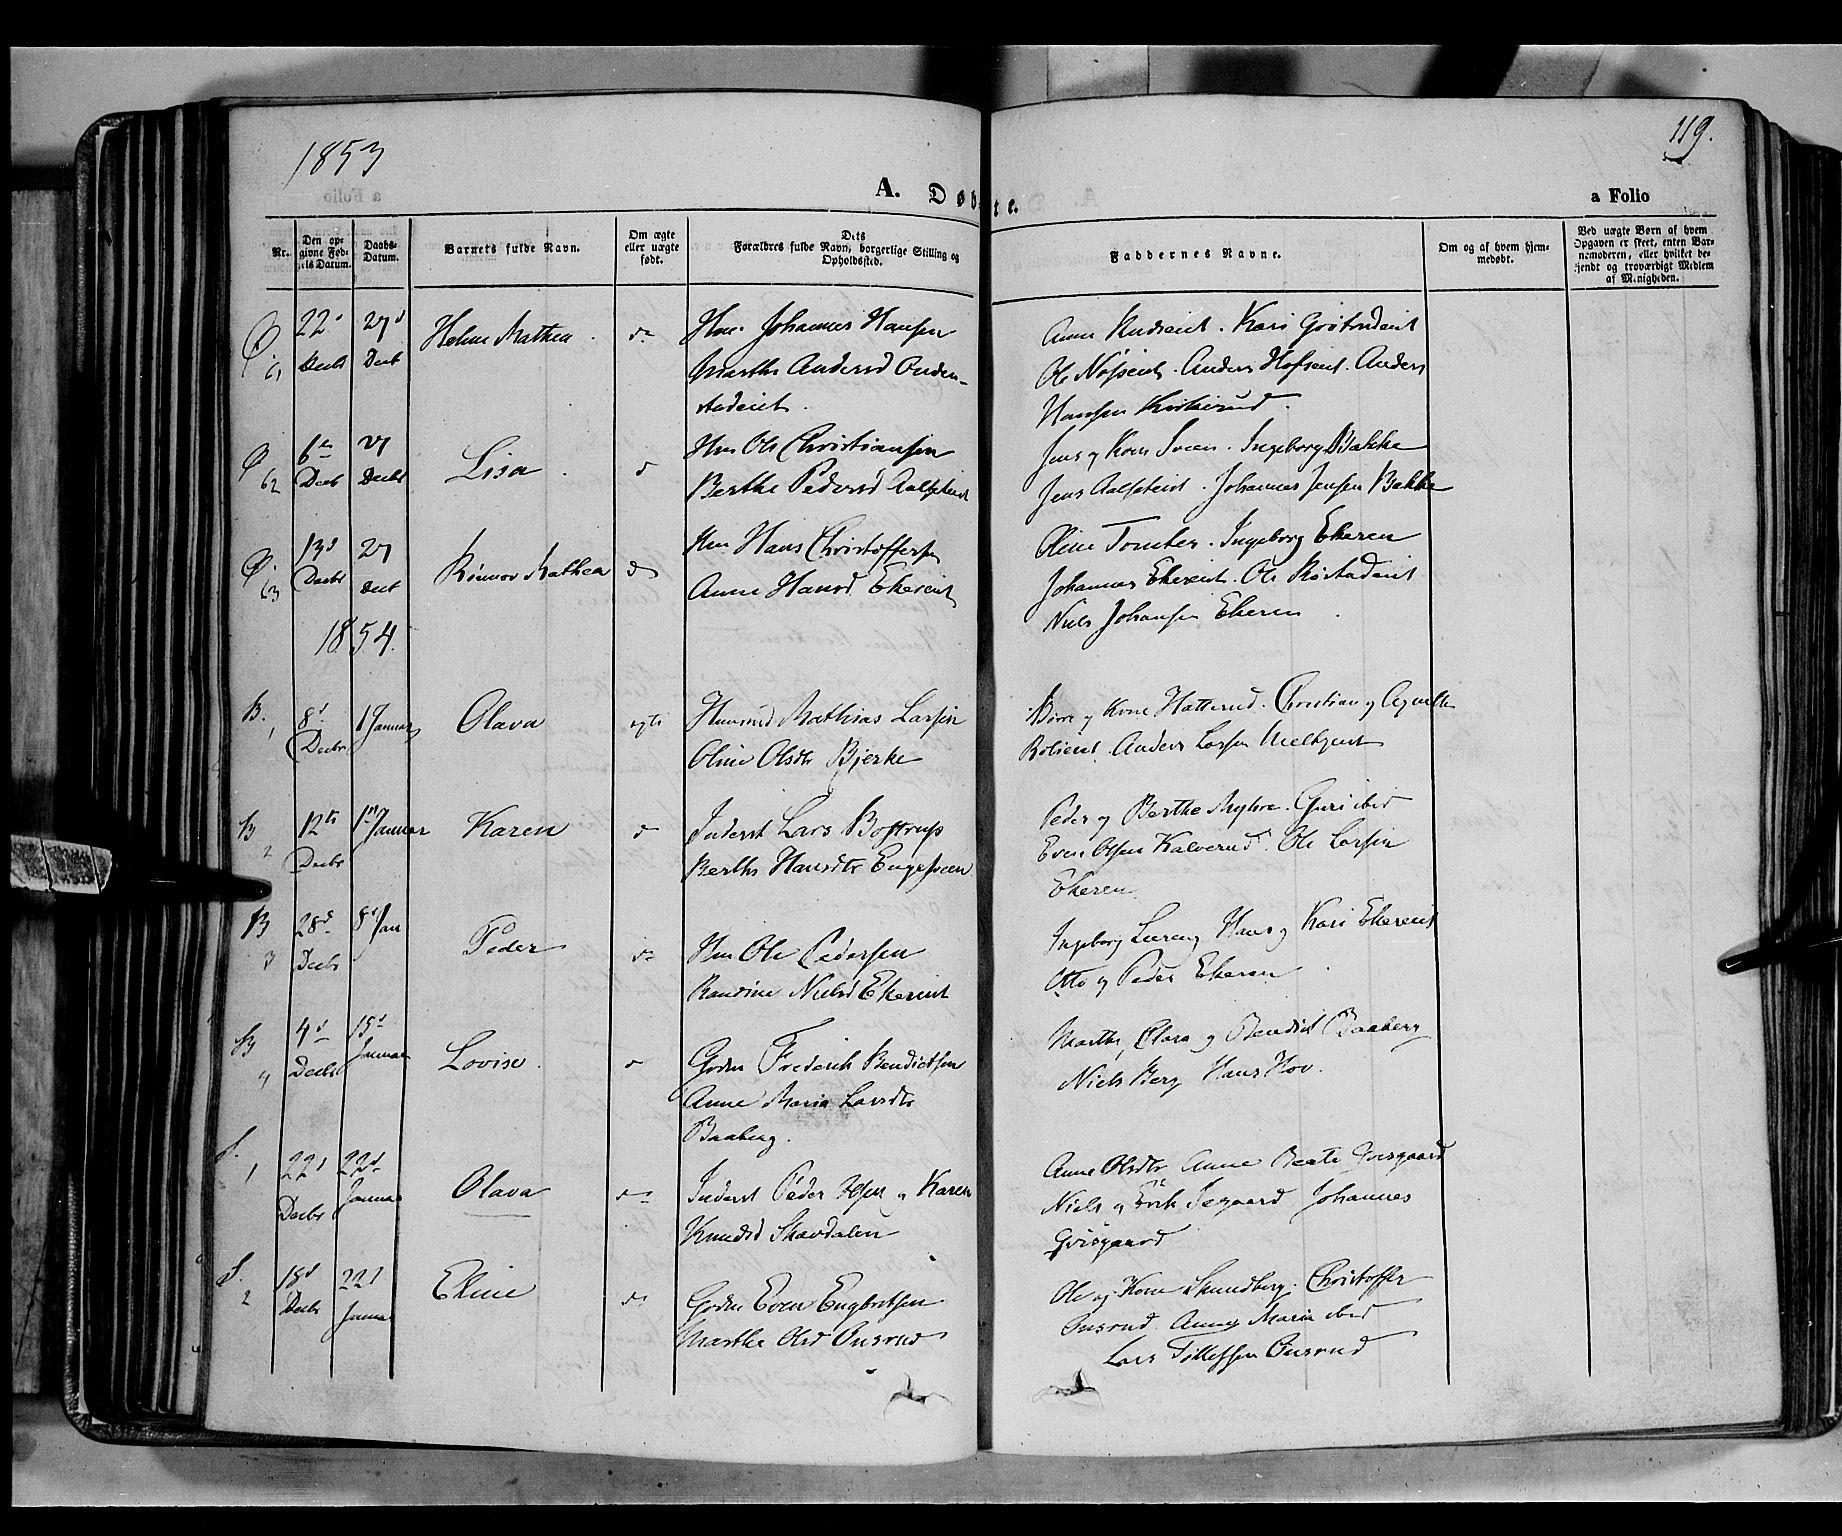 SAH, Biri prestekontor, Ministerialbok nr. 5, 1843-1854, s. 119